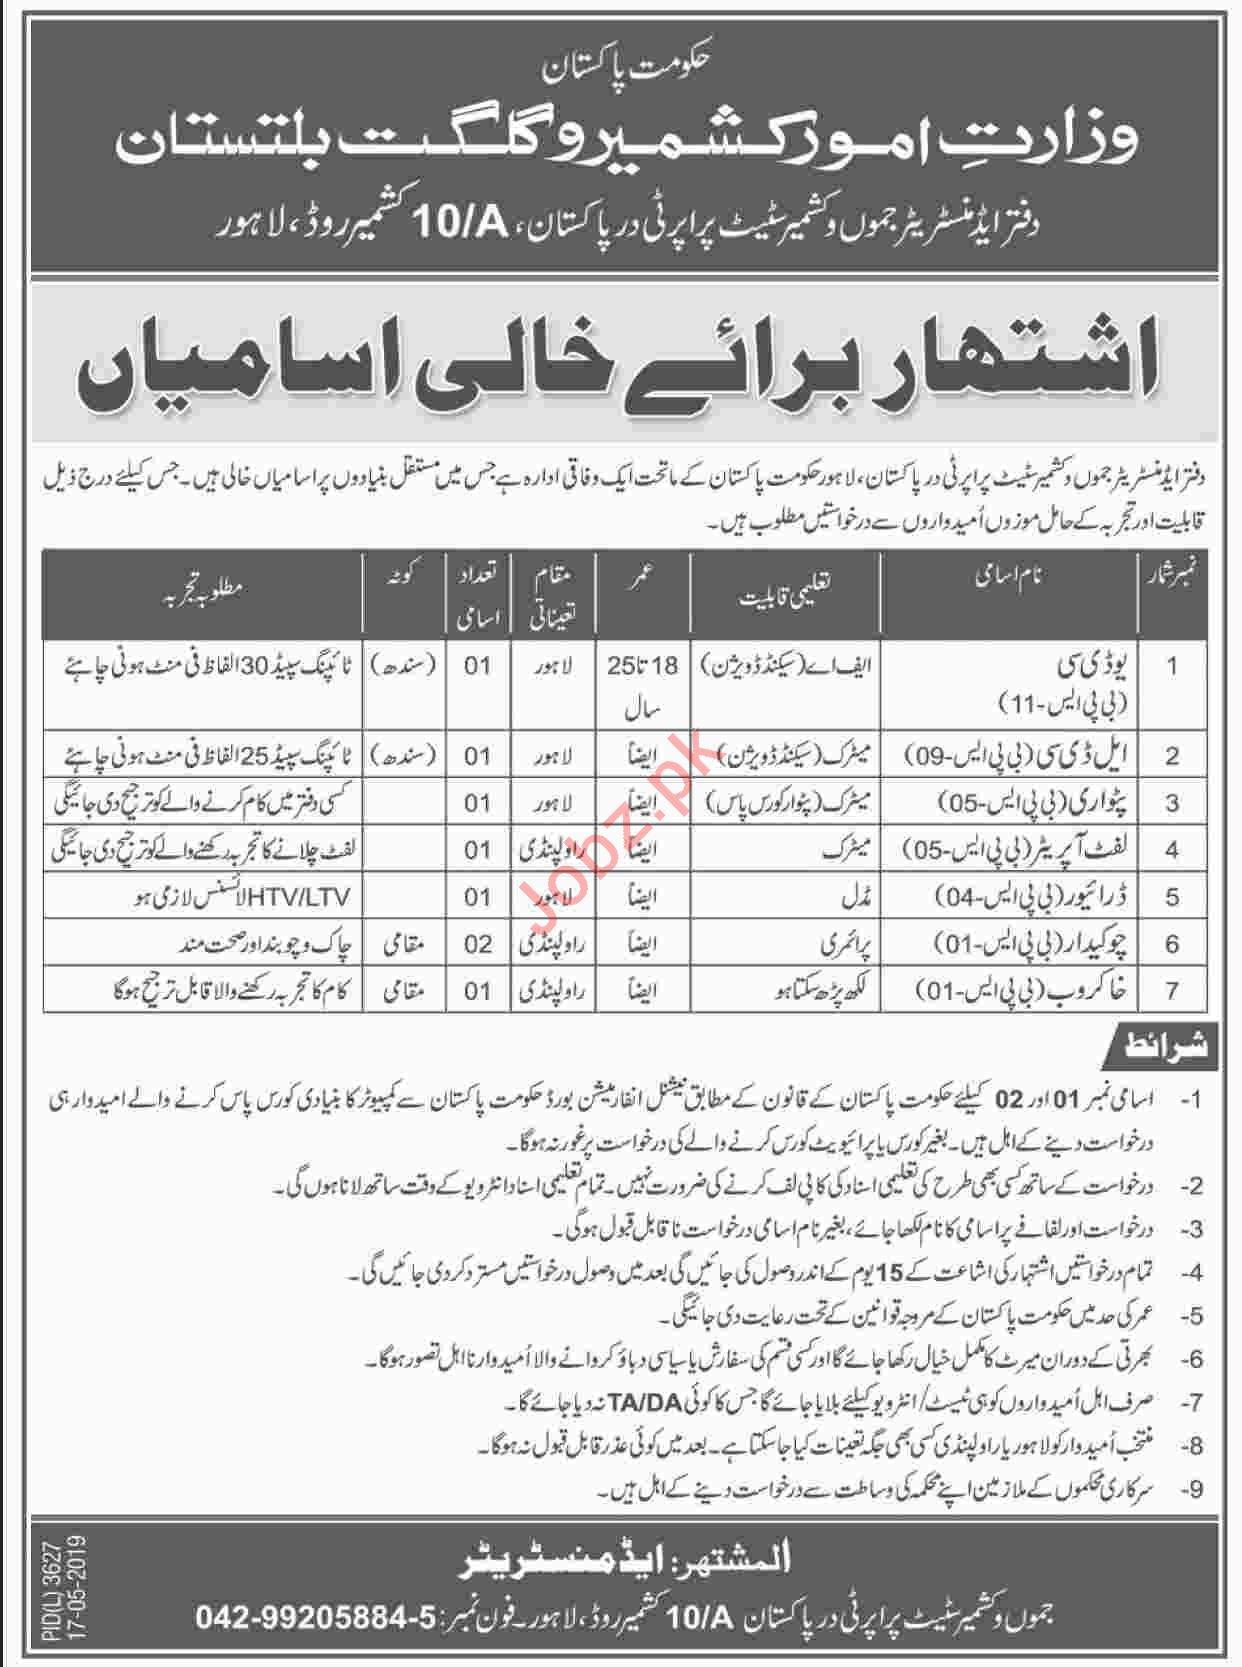 Ministry of Kashmir Affairs & Gilgit Baltistan Jobs 2019